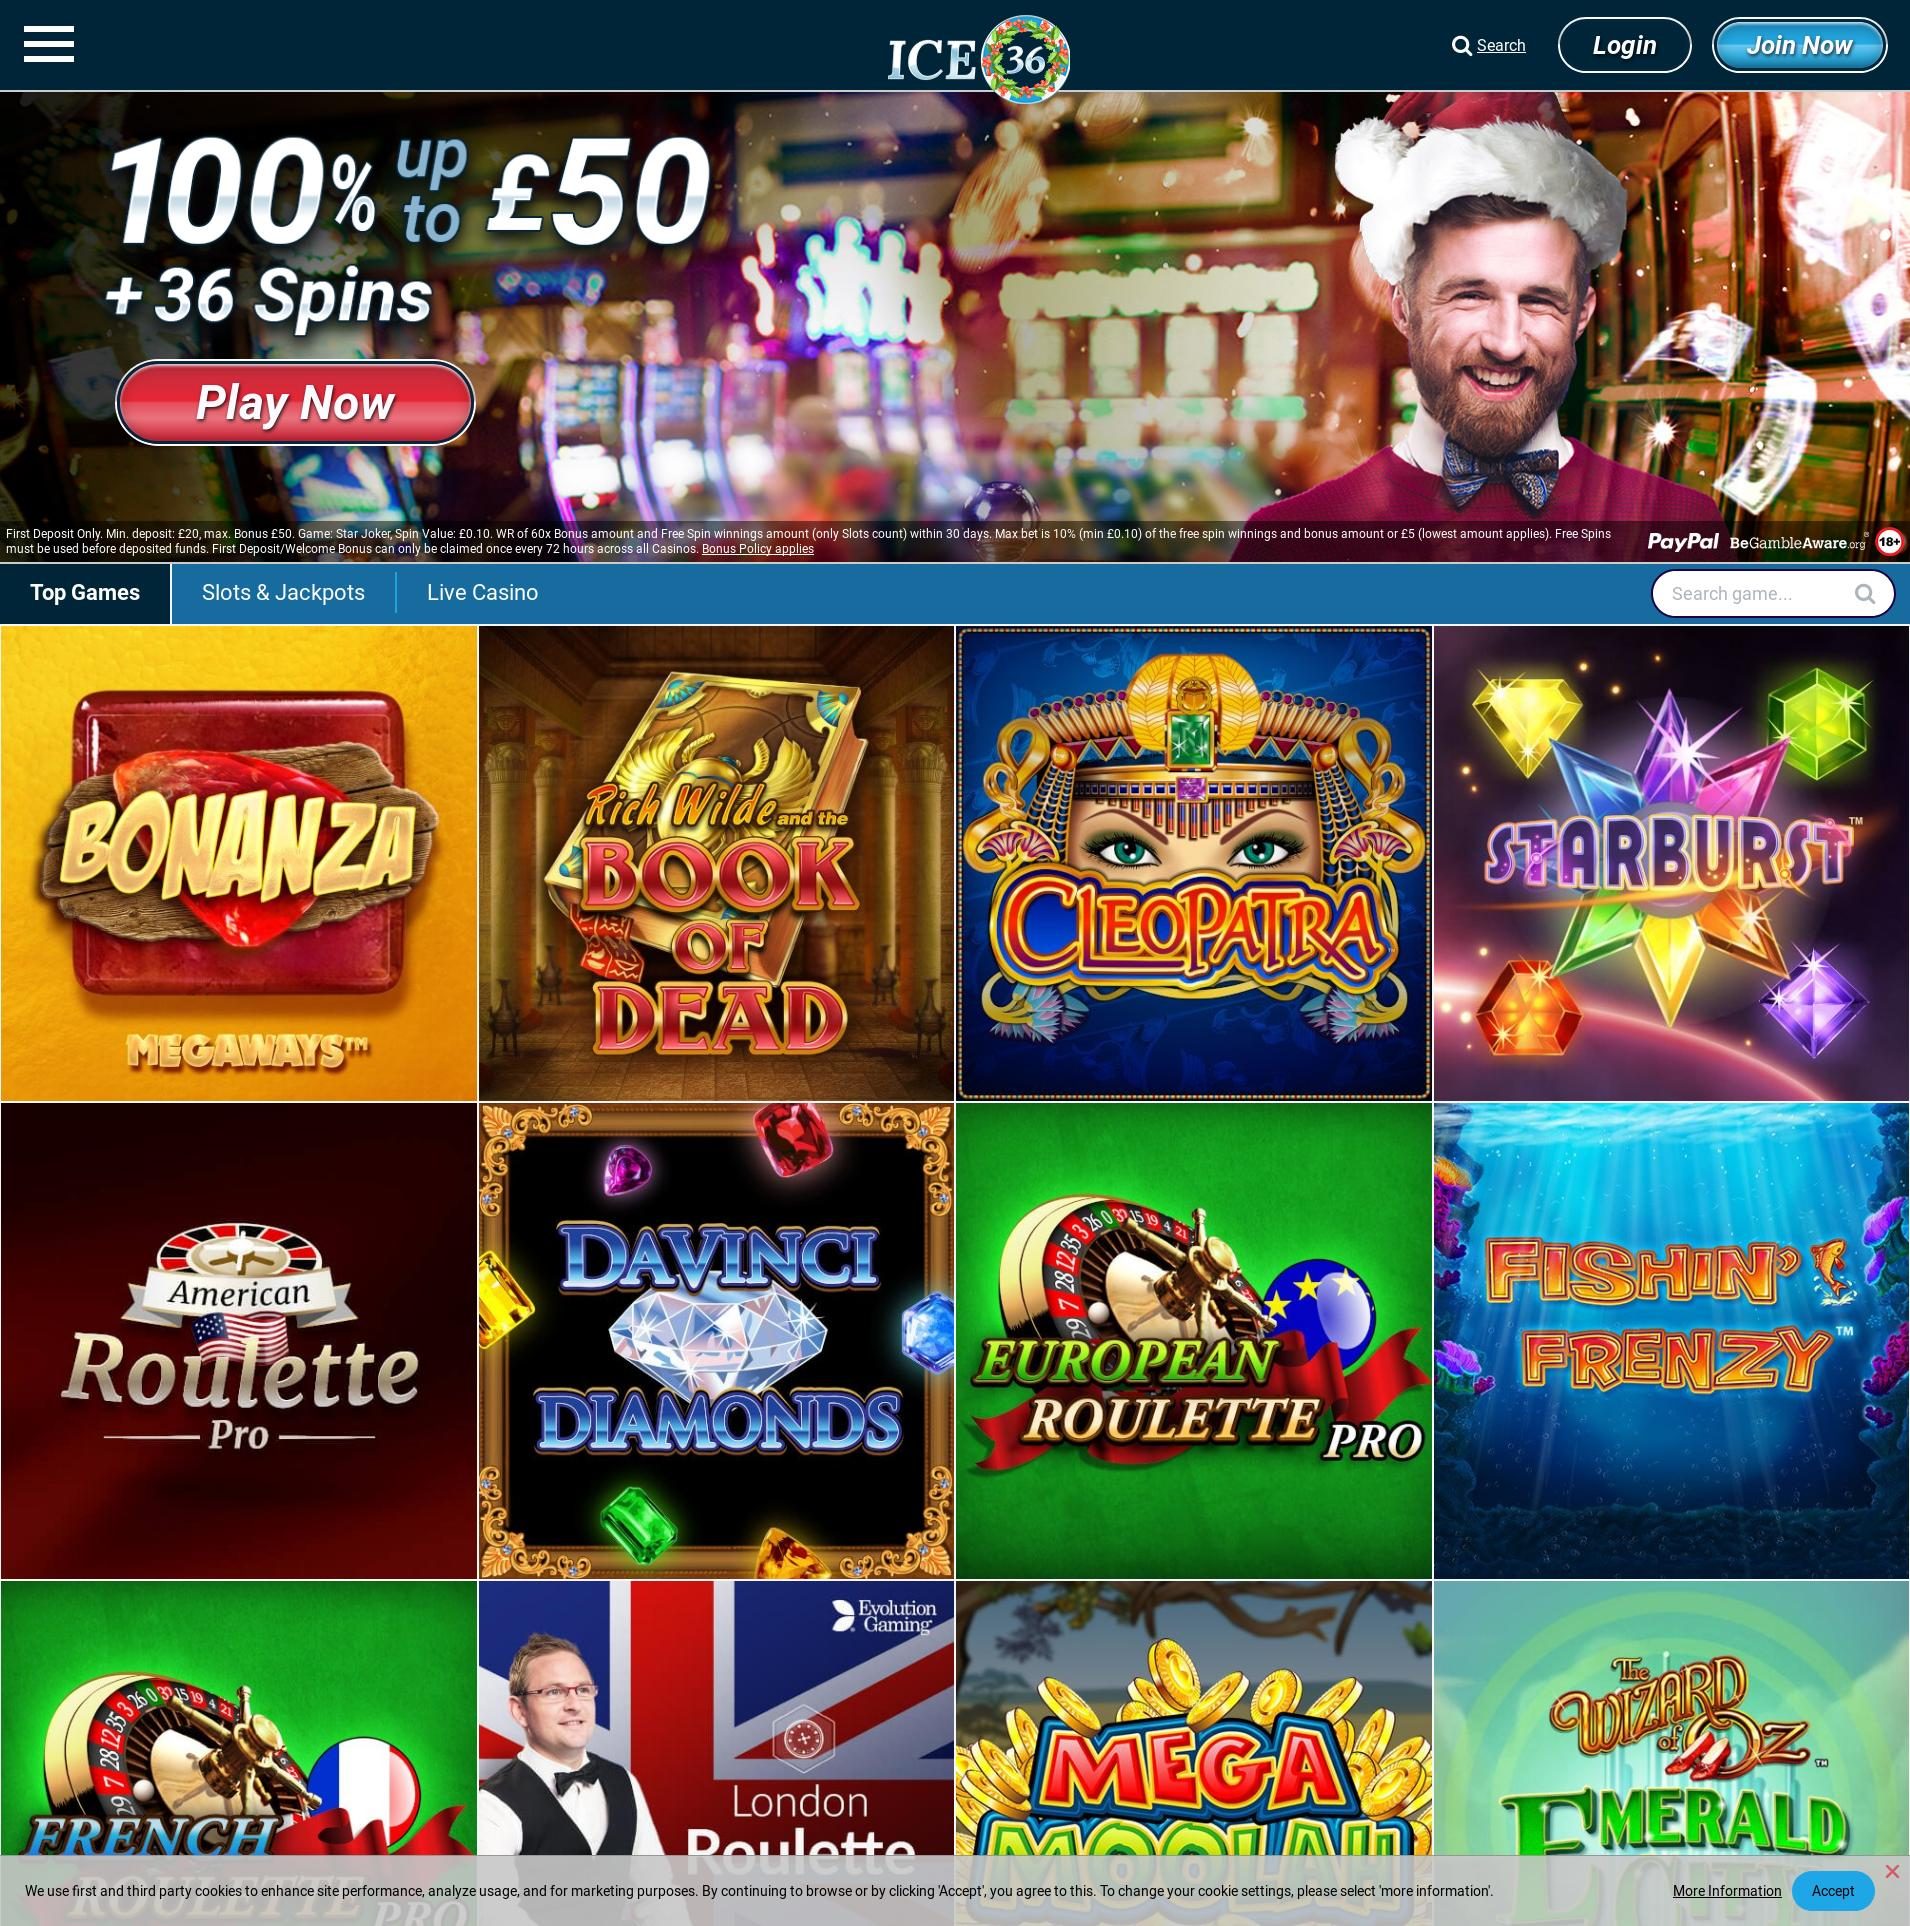 Casino screen Lobby 2019-12-13 for United Kingdom